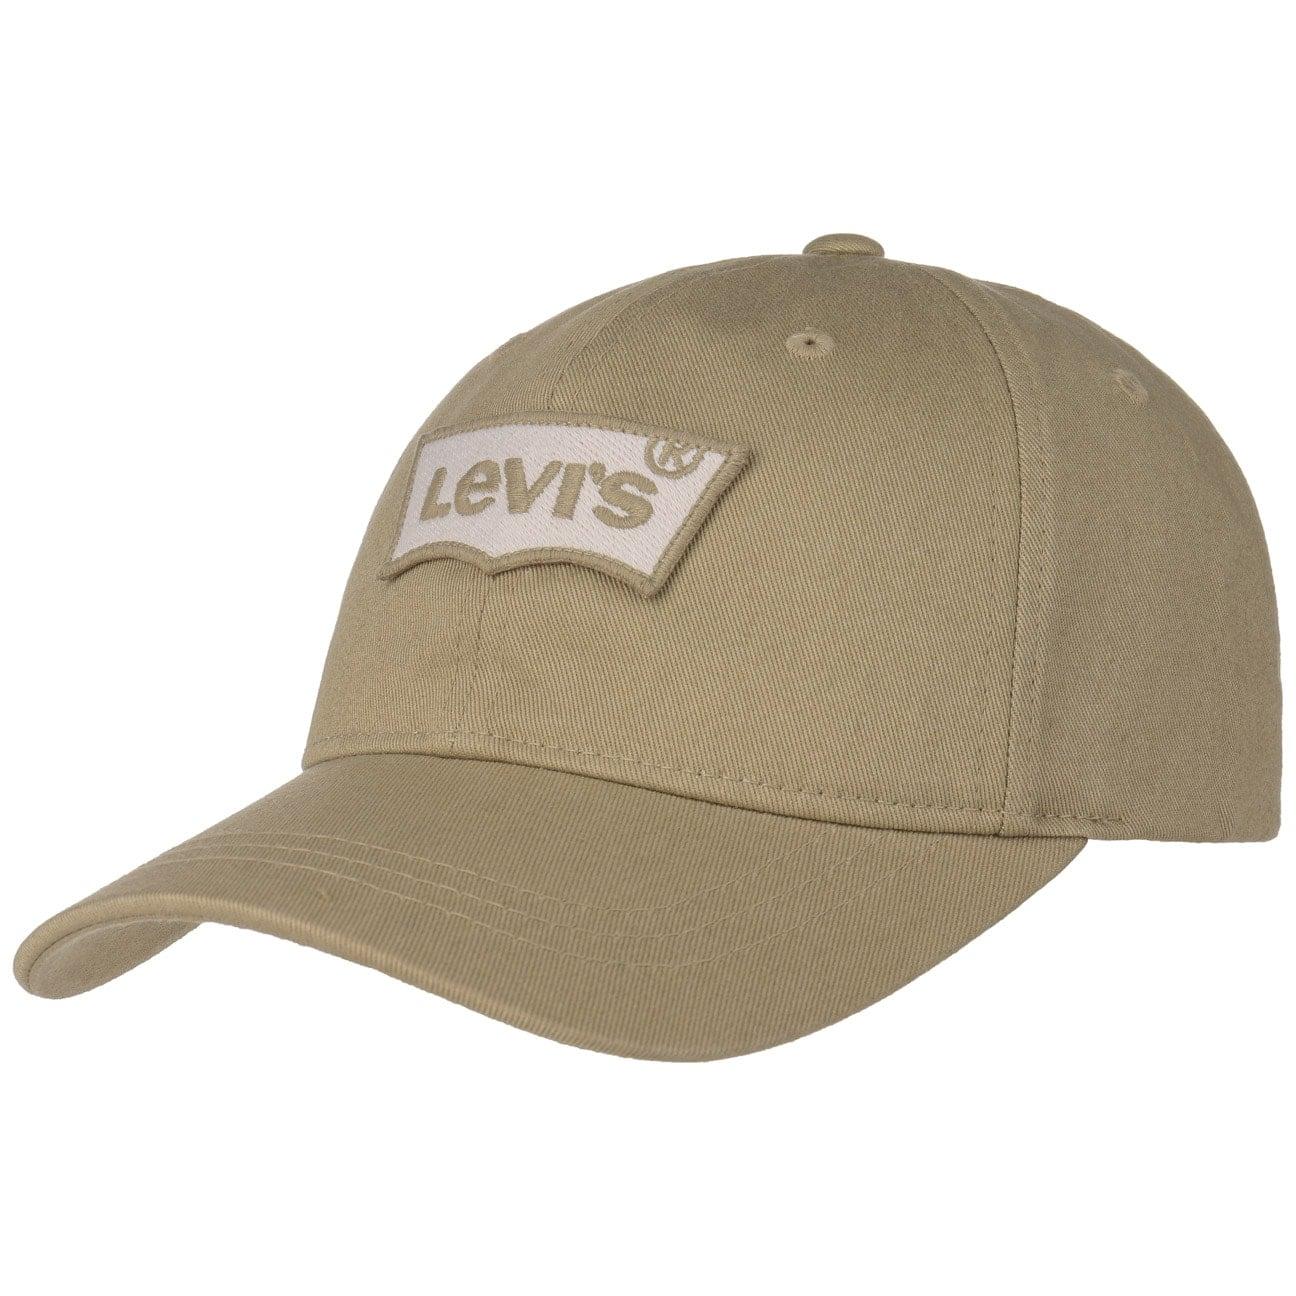 Batwing Strapback Cap by Levis  gorra de baseball